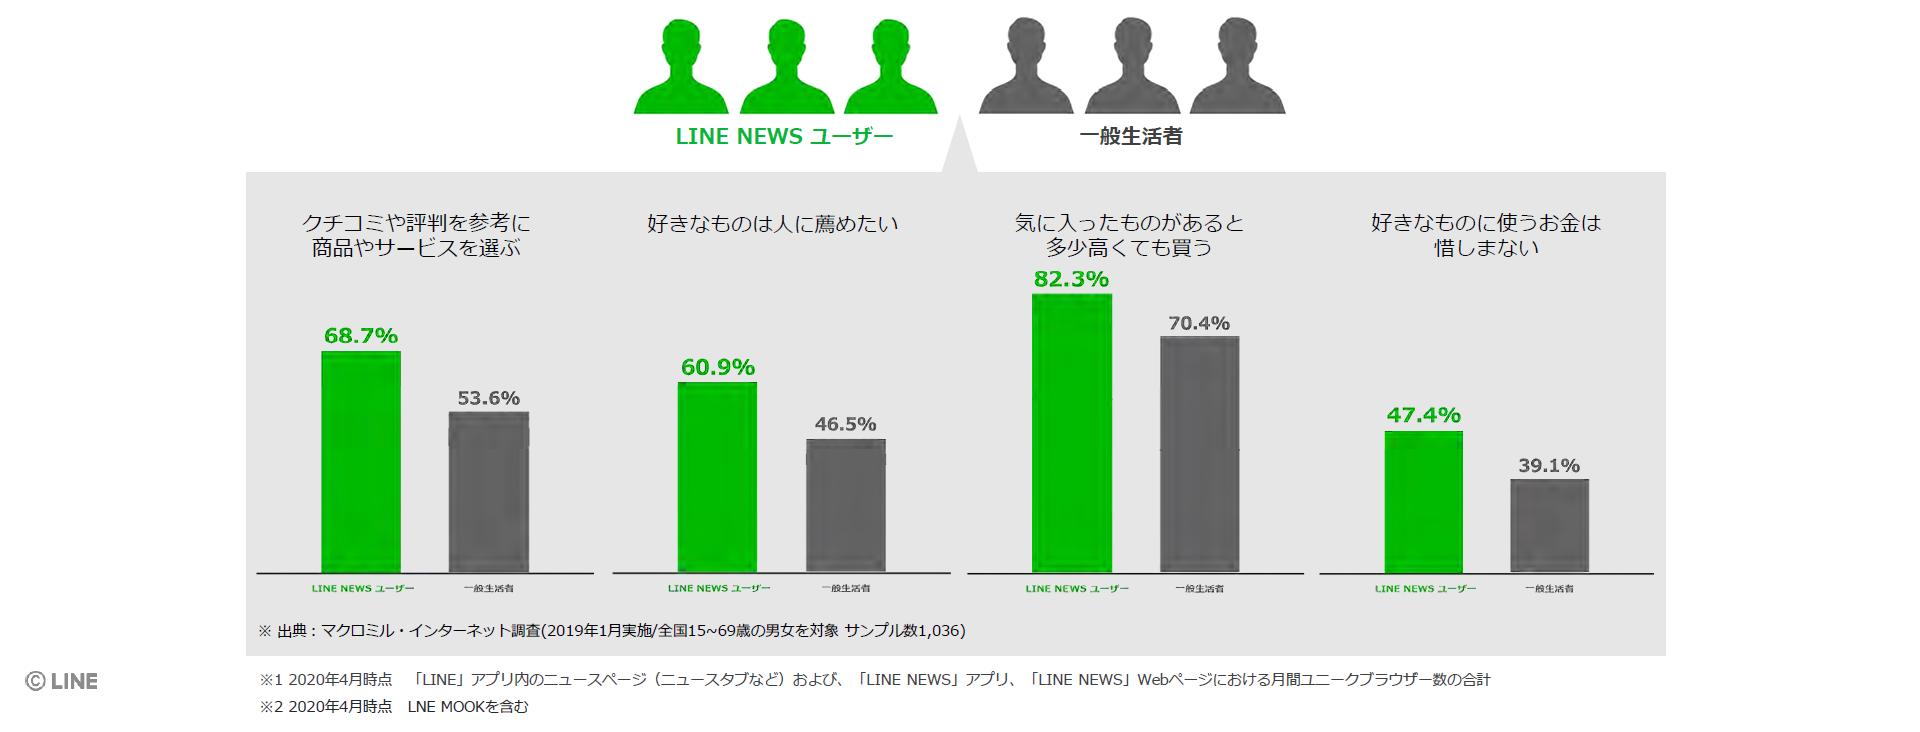 LINE NEWSのユーザー